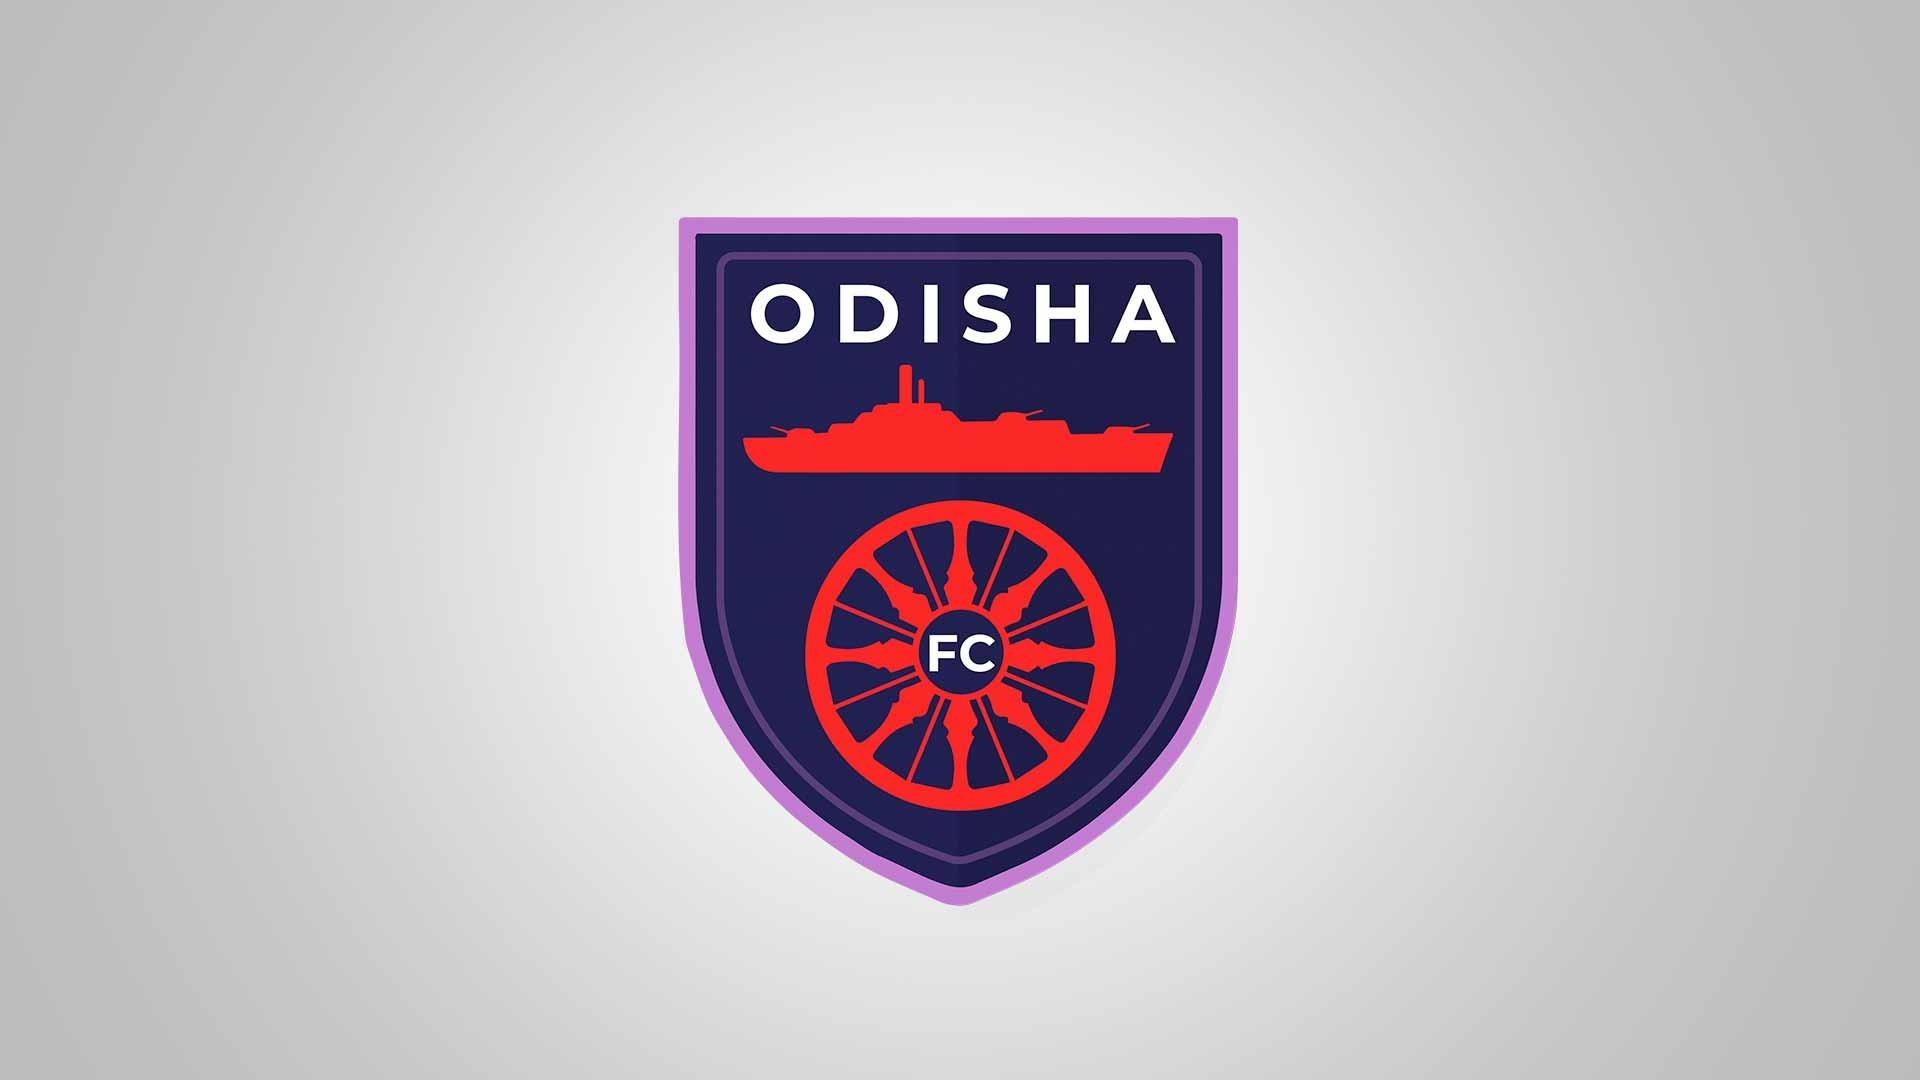 Odisha FC KreedOn